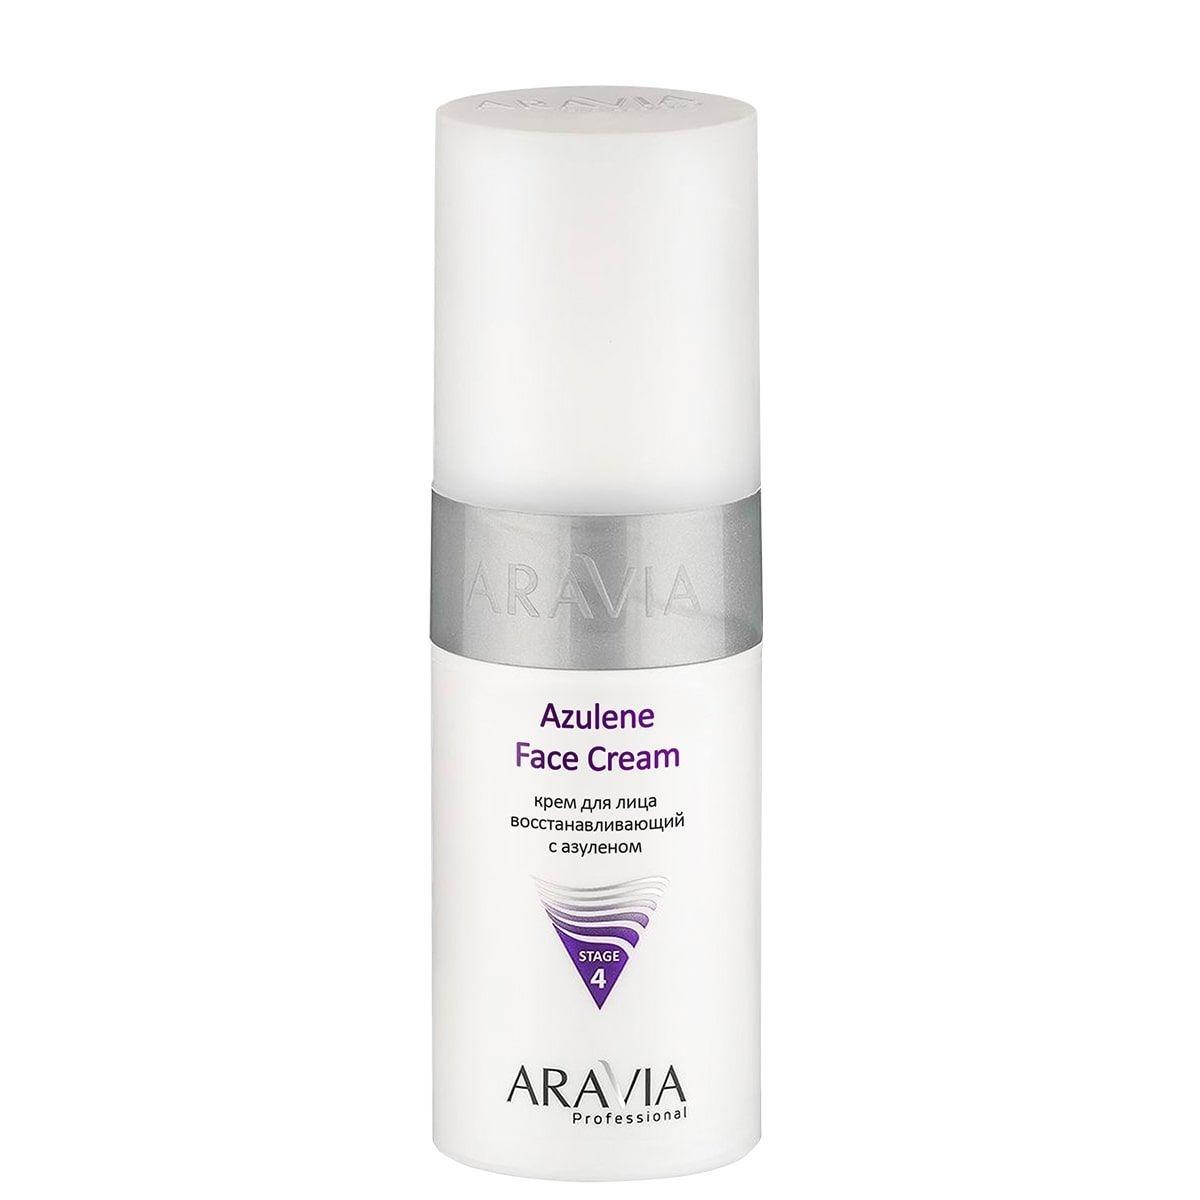 ARAVIA Крем для Лица Восстанавливающий с Азуленом Azulene Face Cream, 150 мл usb flash drive 128gb a data uv150 black auv150 128g rbk